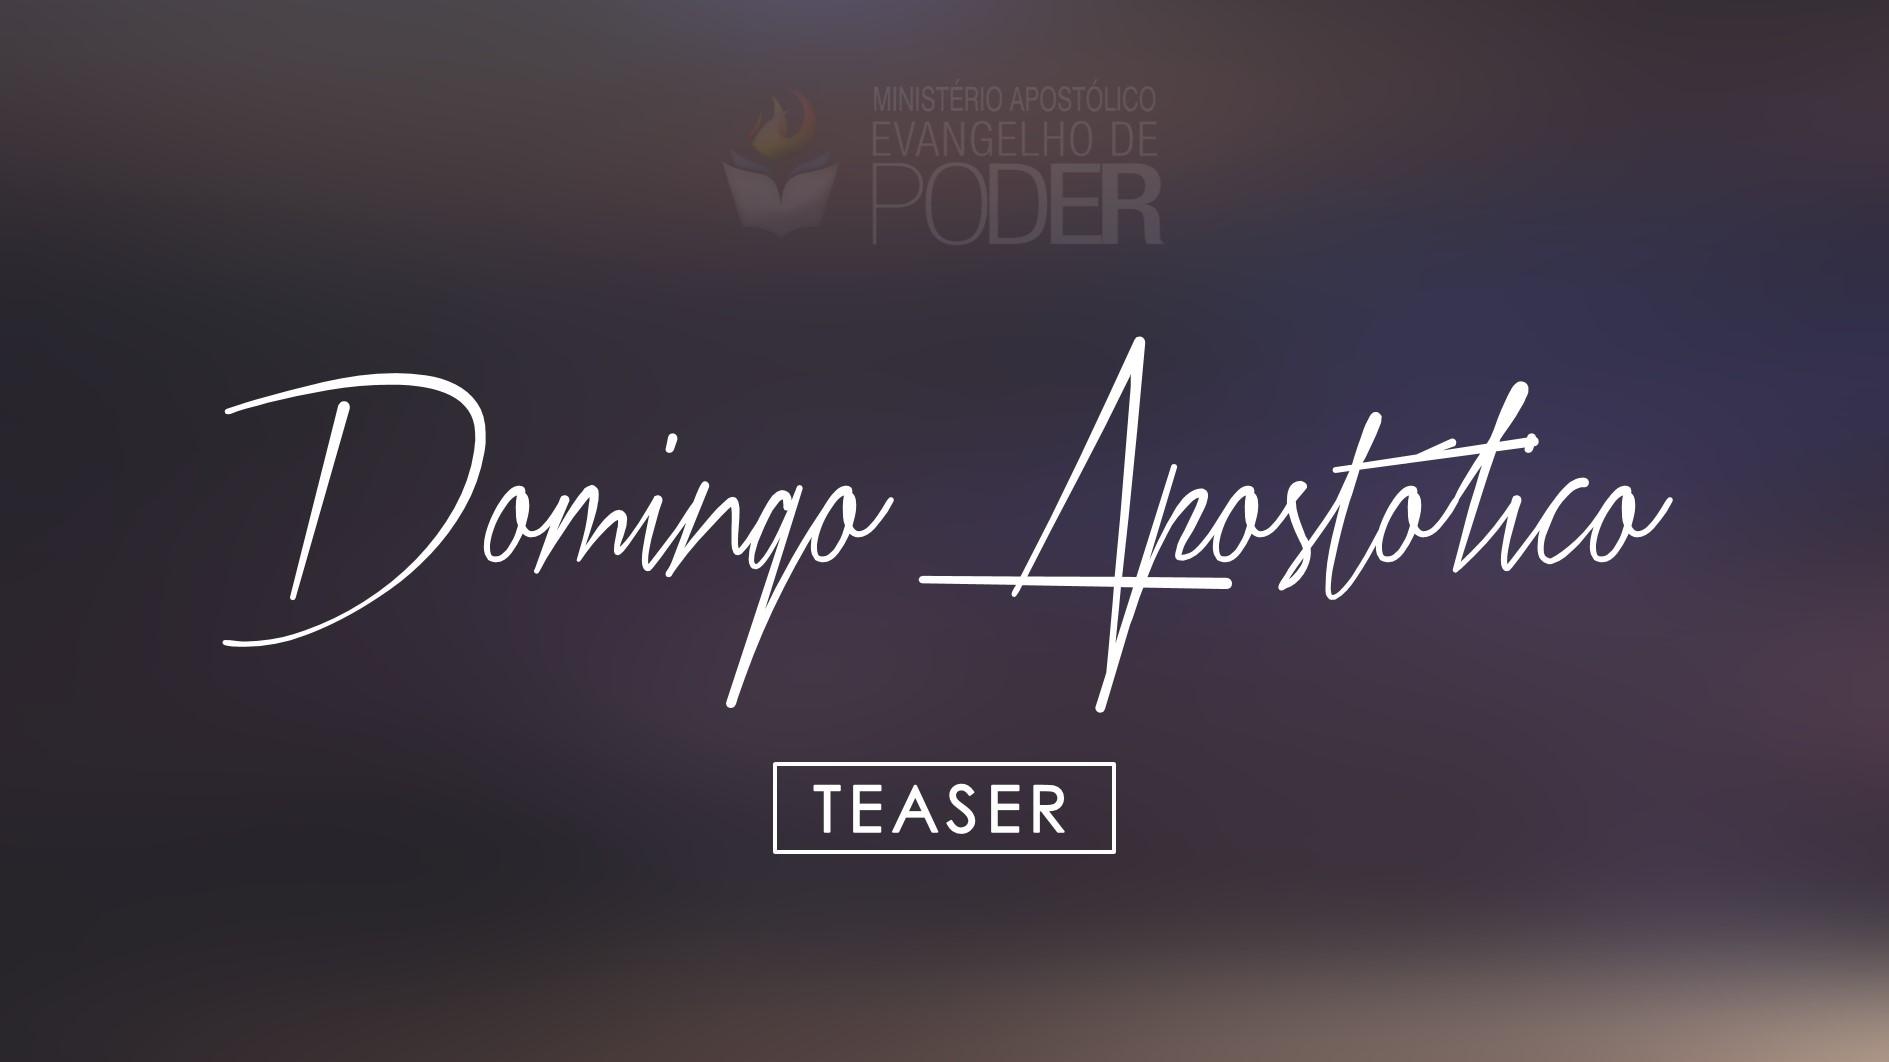 DOMINGO APOSTÓLICO (27, Ago 2017) - TEASER